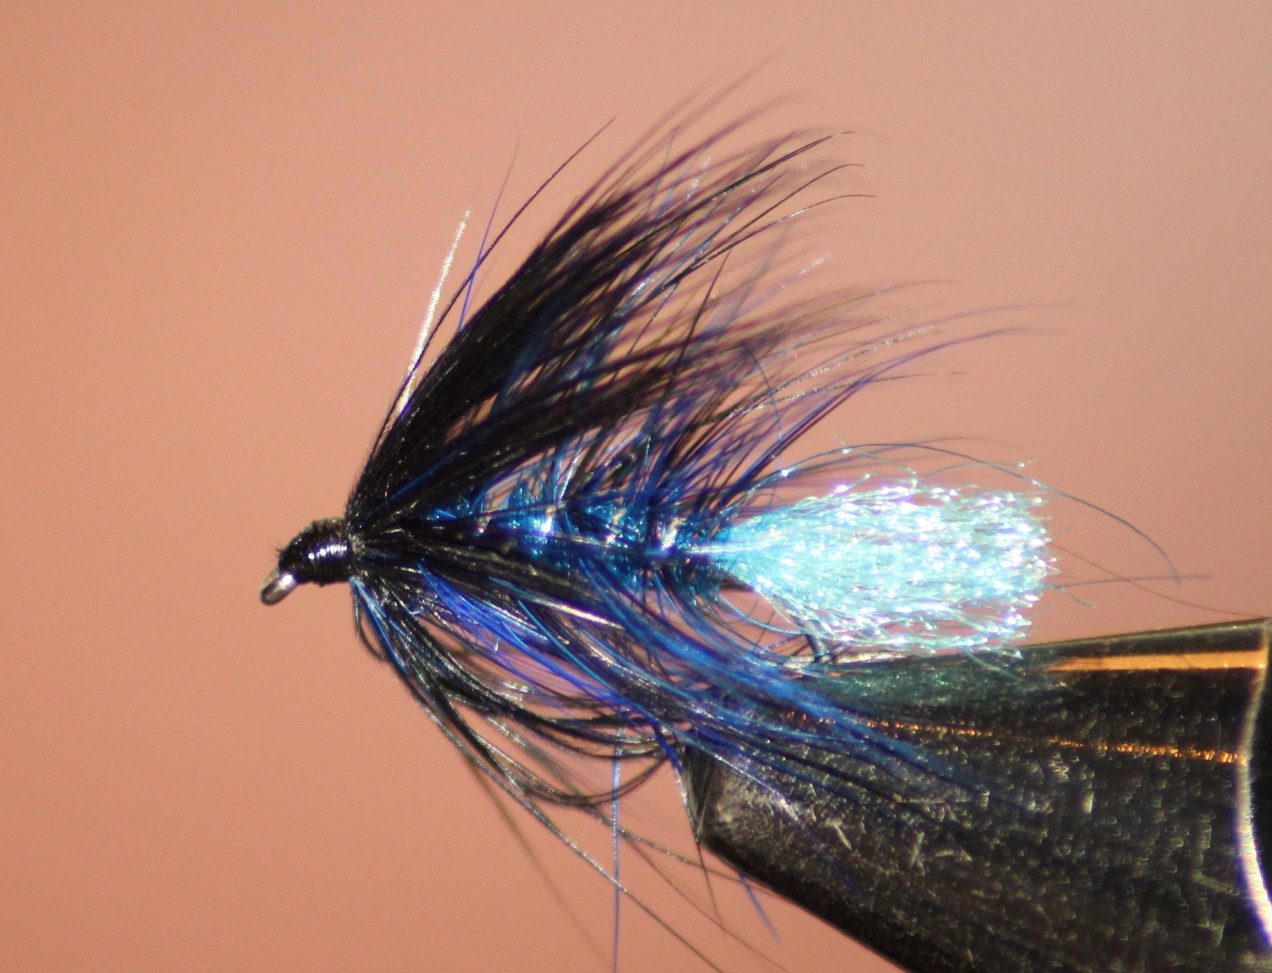 Irish Fly Supplies mallard flight feathers in Claret.